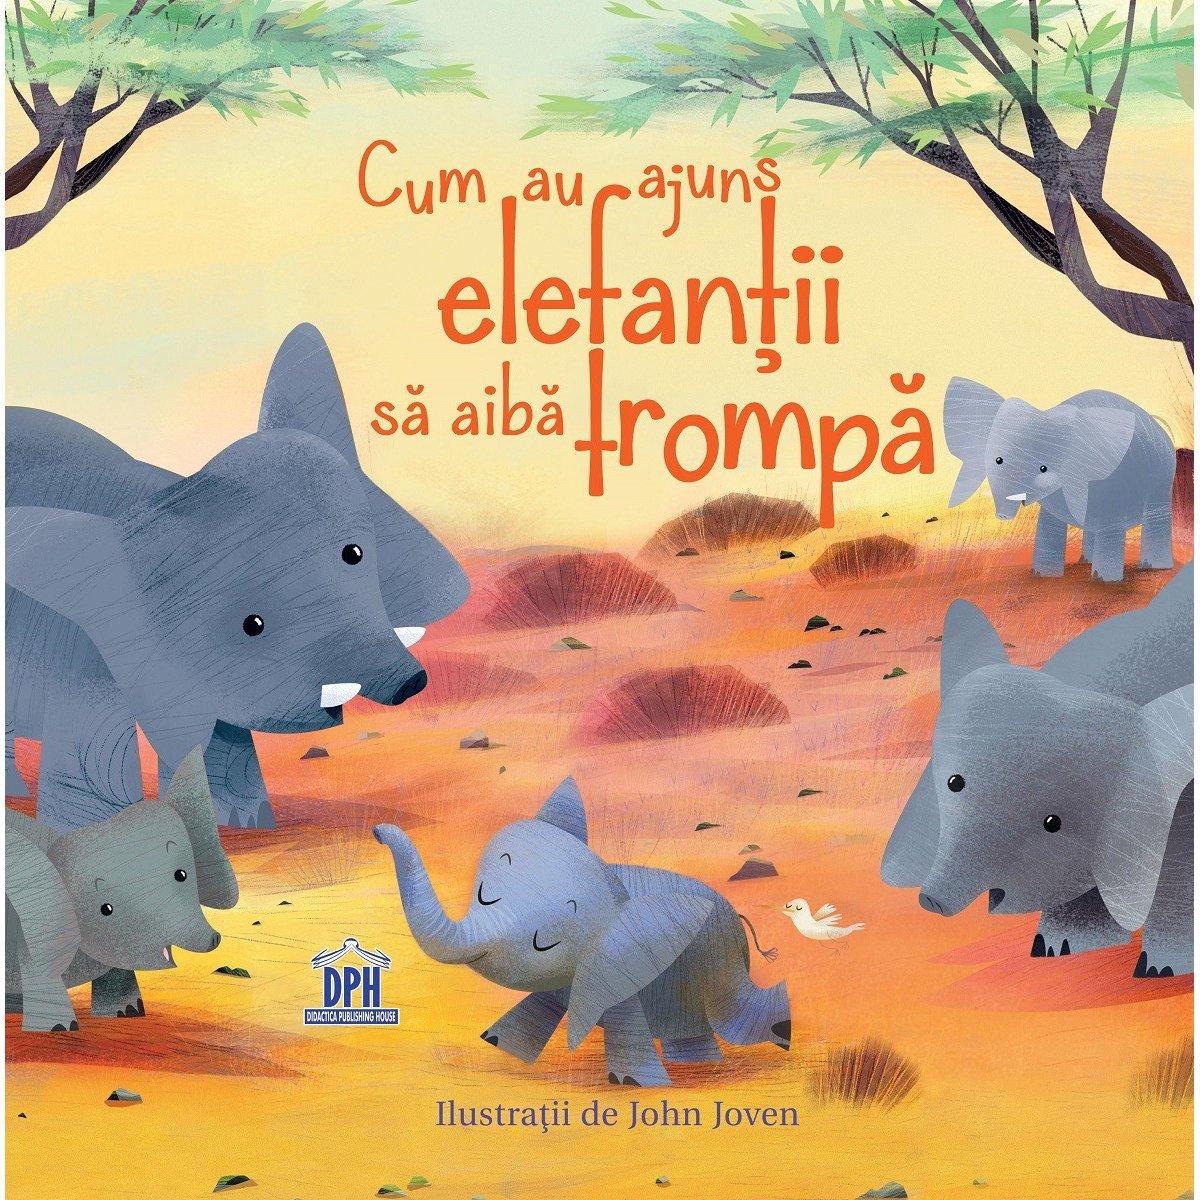 Carte Cum au ajuns elefantii sa aiba trompa, Editura DPH